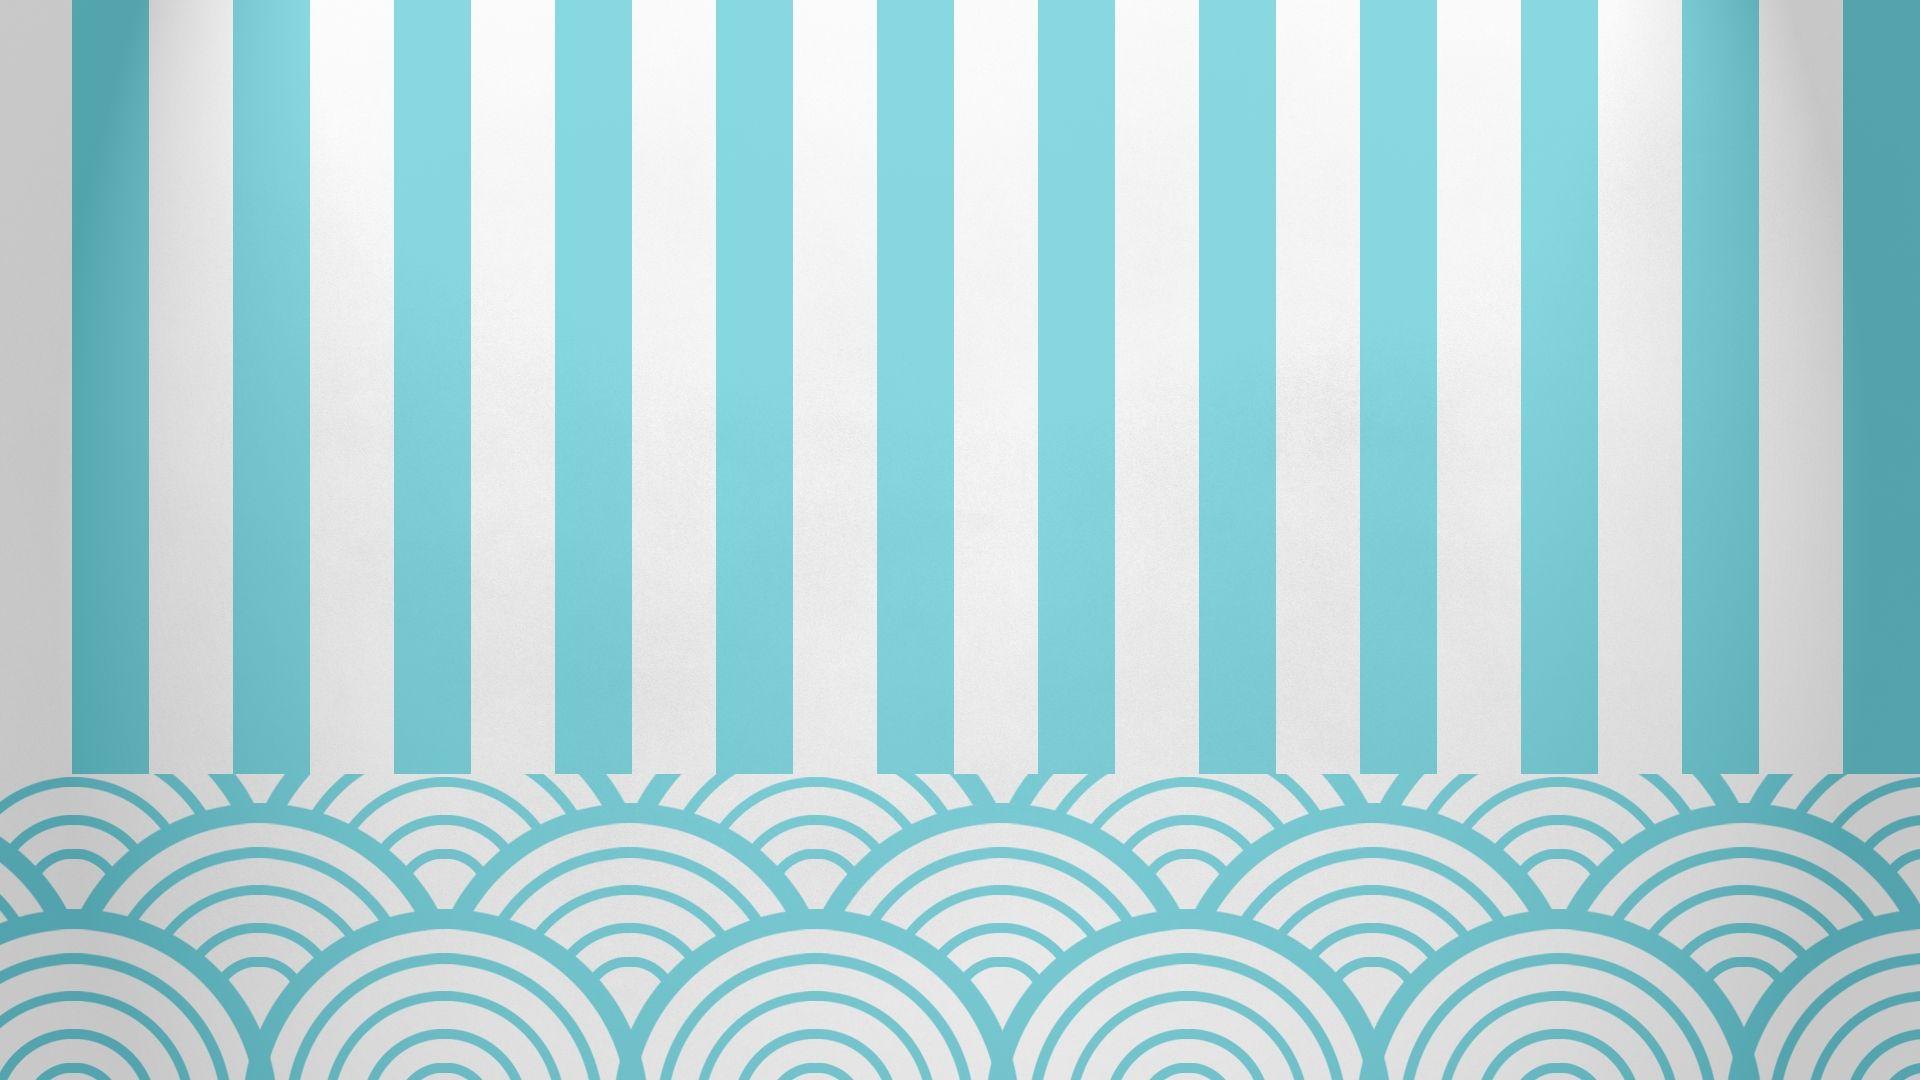 Cute Blue desktop wallpaper download